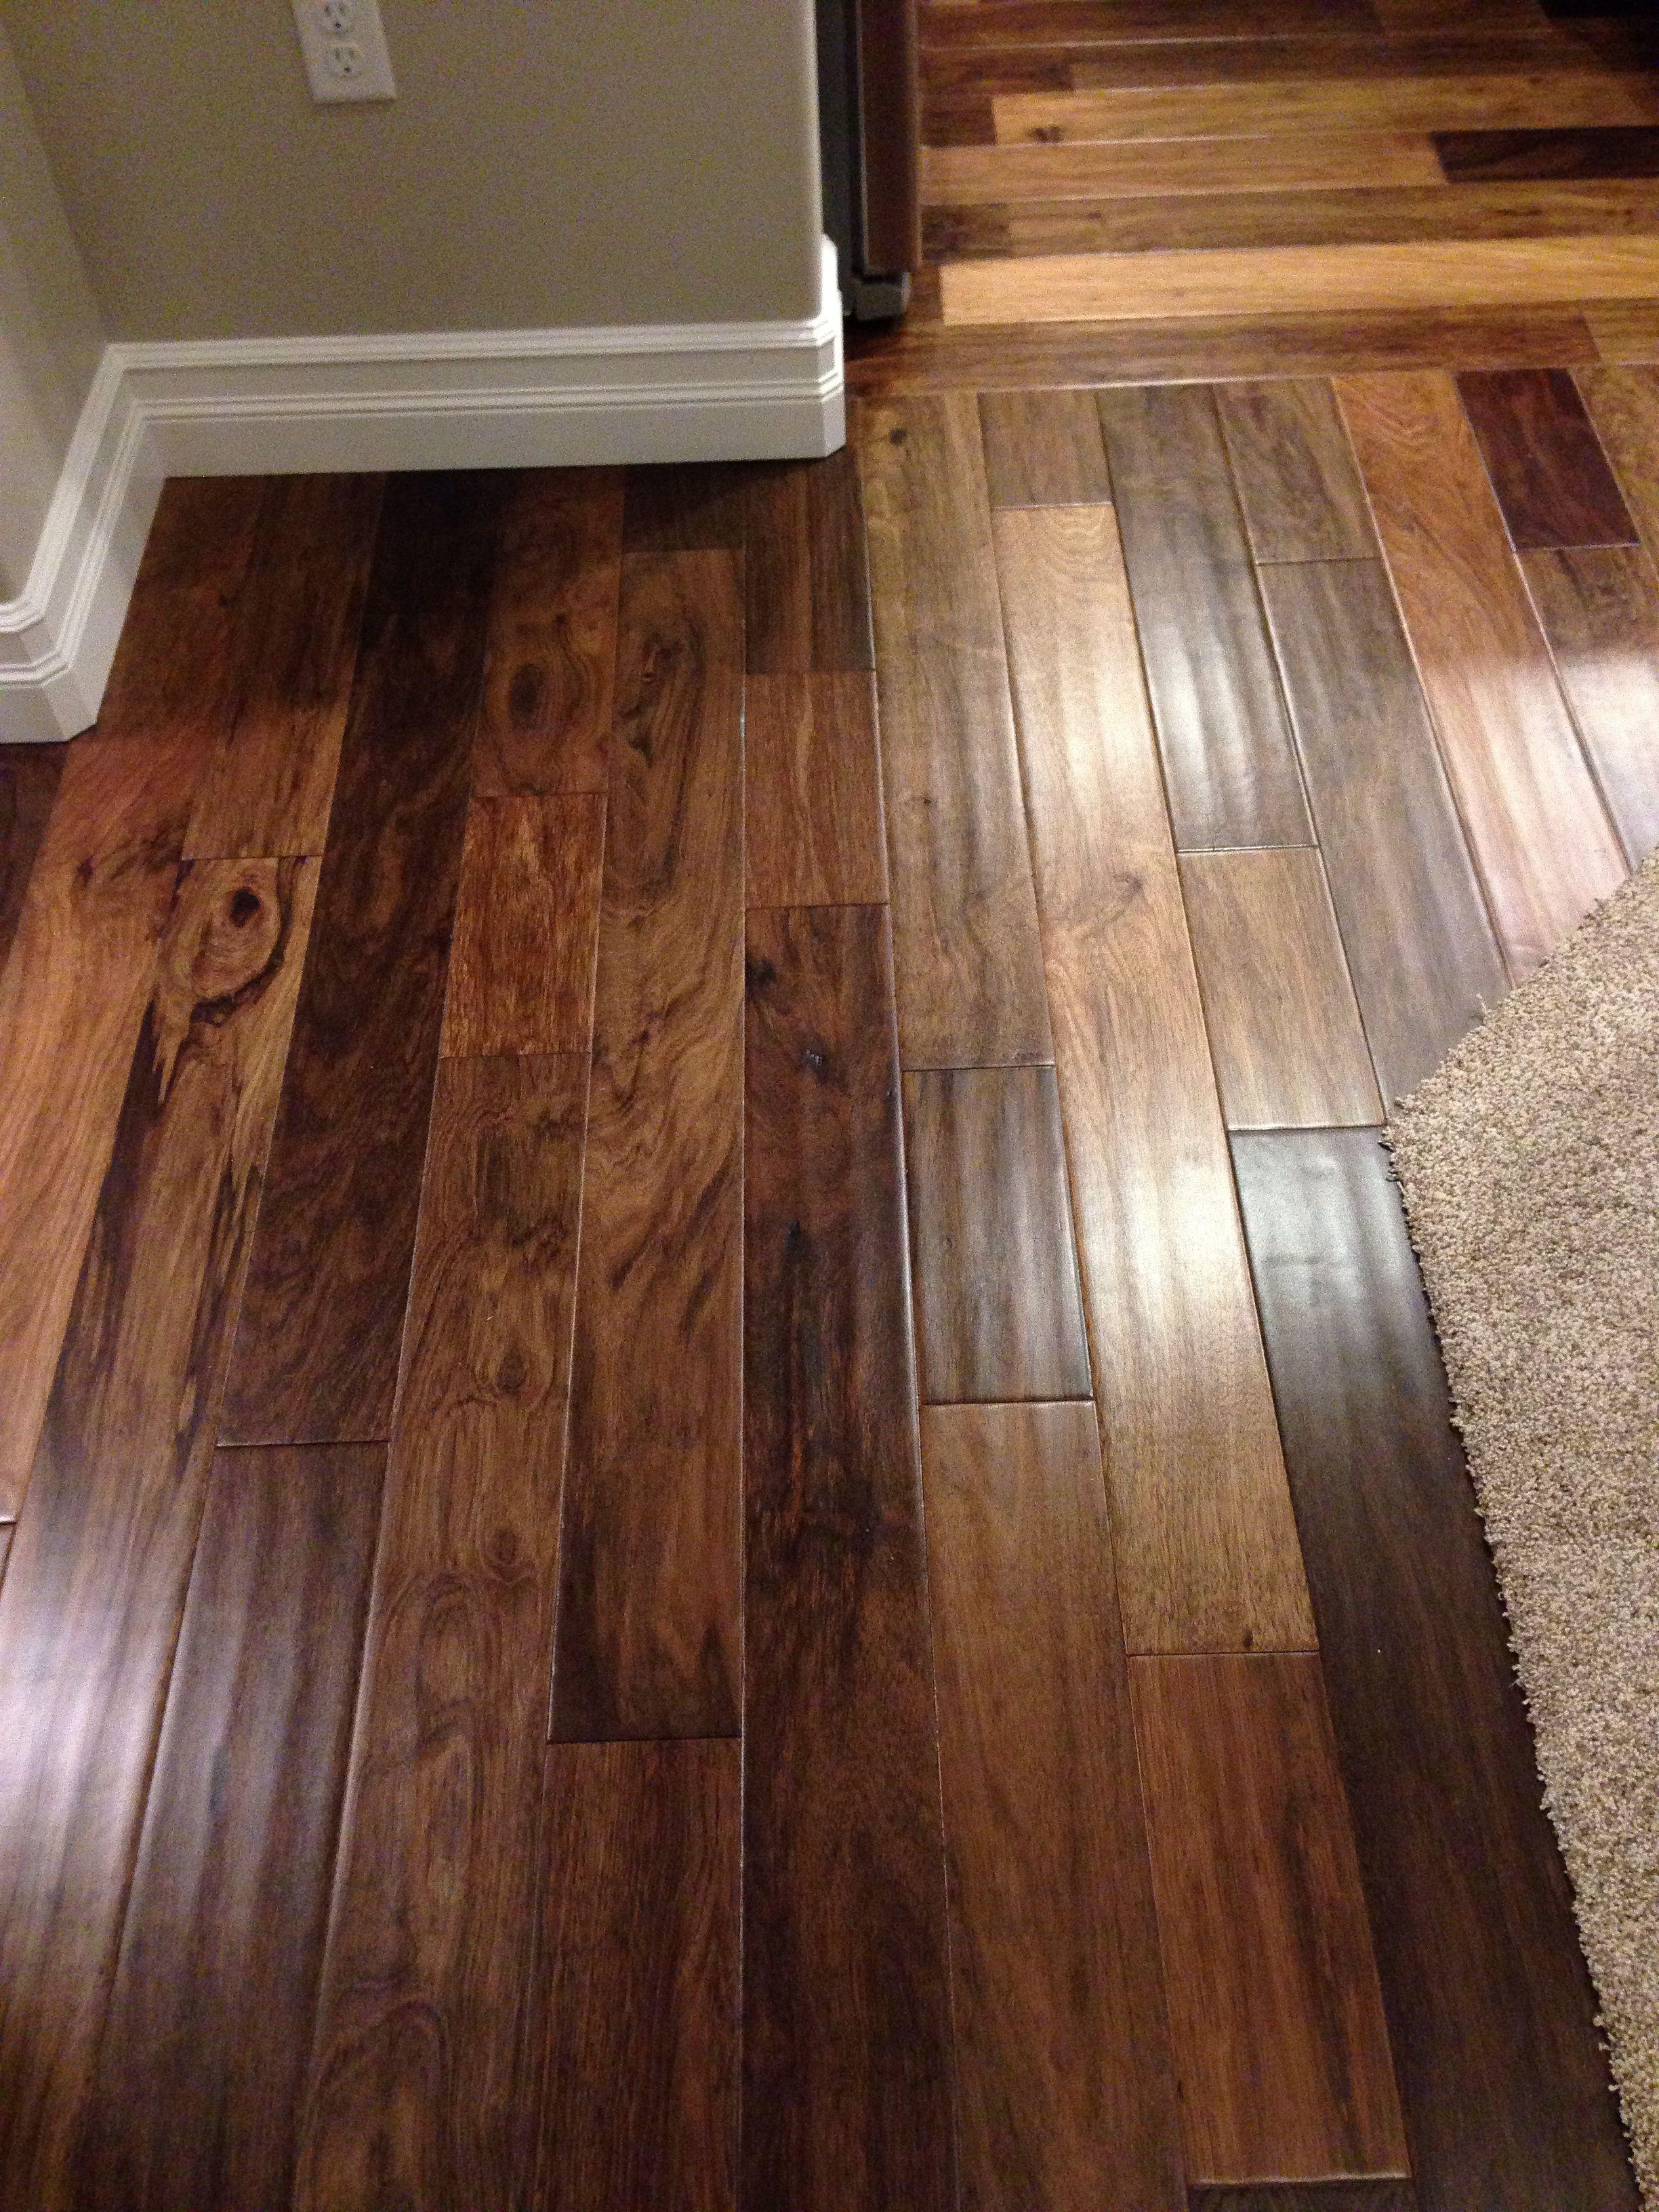 3 4 vs 1 2 inch engineered hardwood flooring of african ebony engineered wood floor by mohawk 5 inch plank hand pertaining to african ebony engineered wood floor by mohawk 5 inch plank hand scraped would